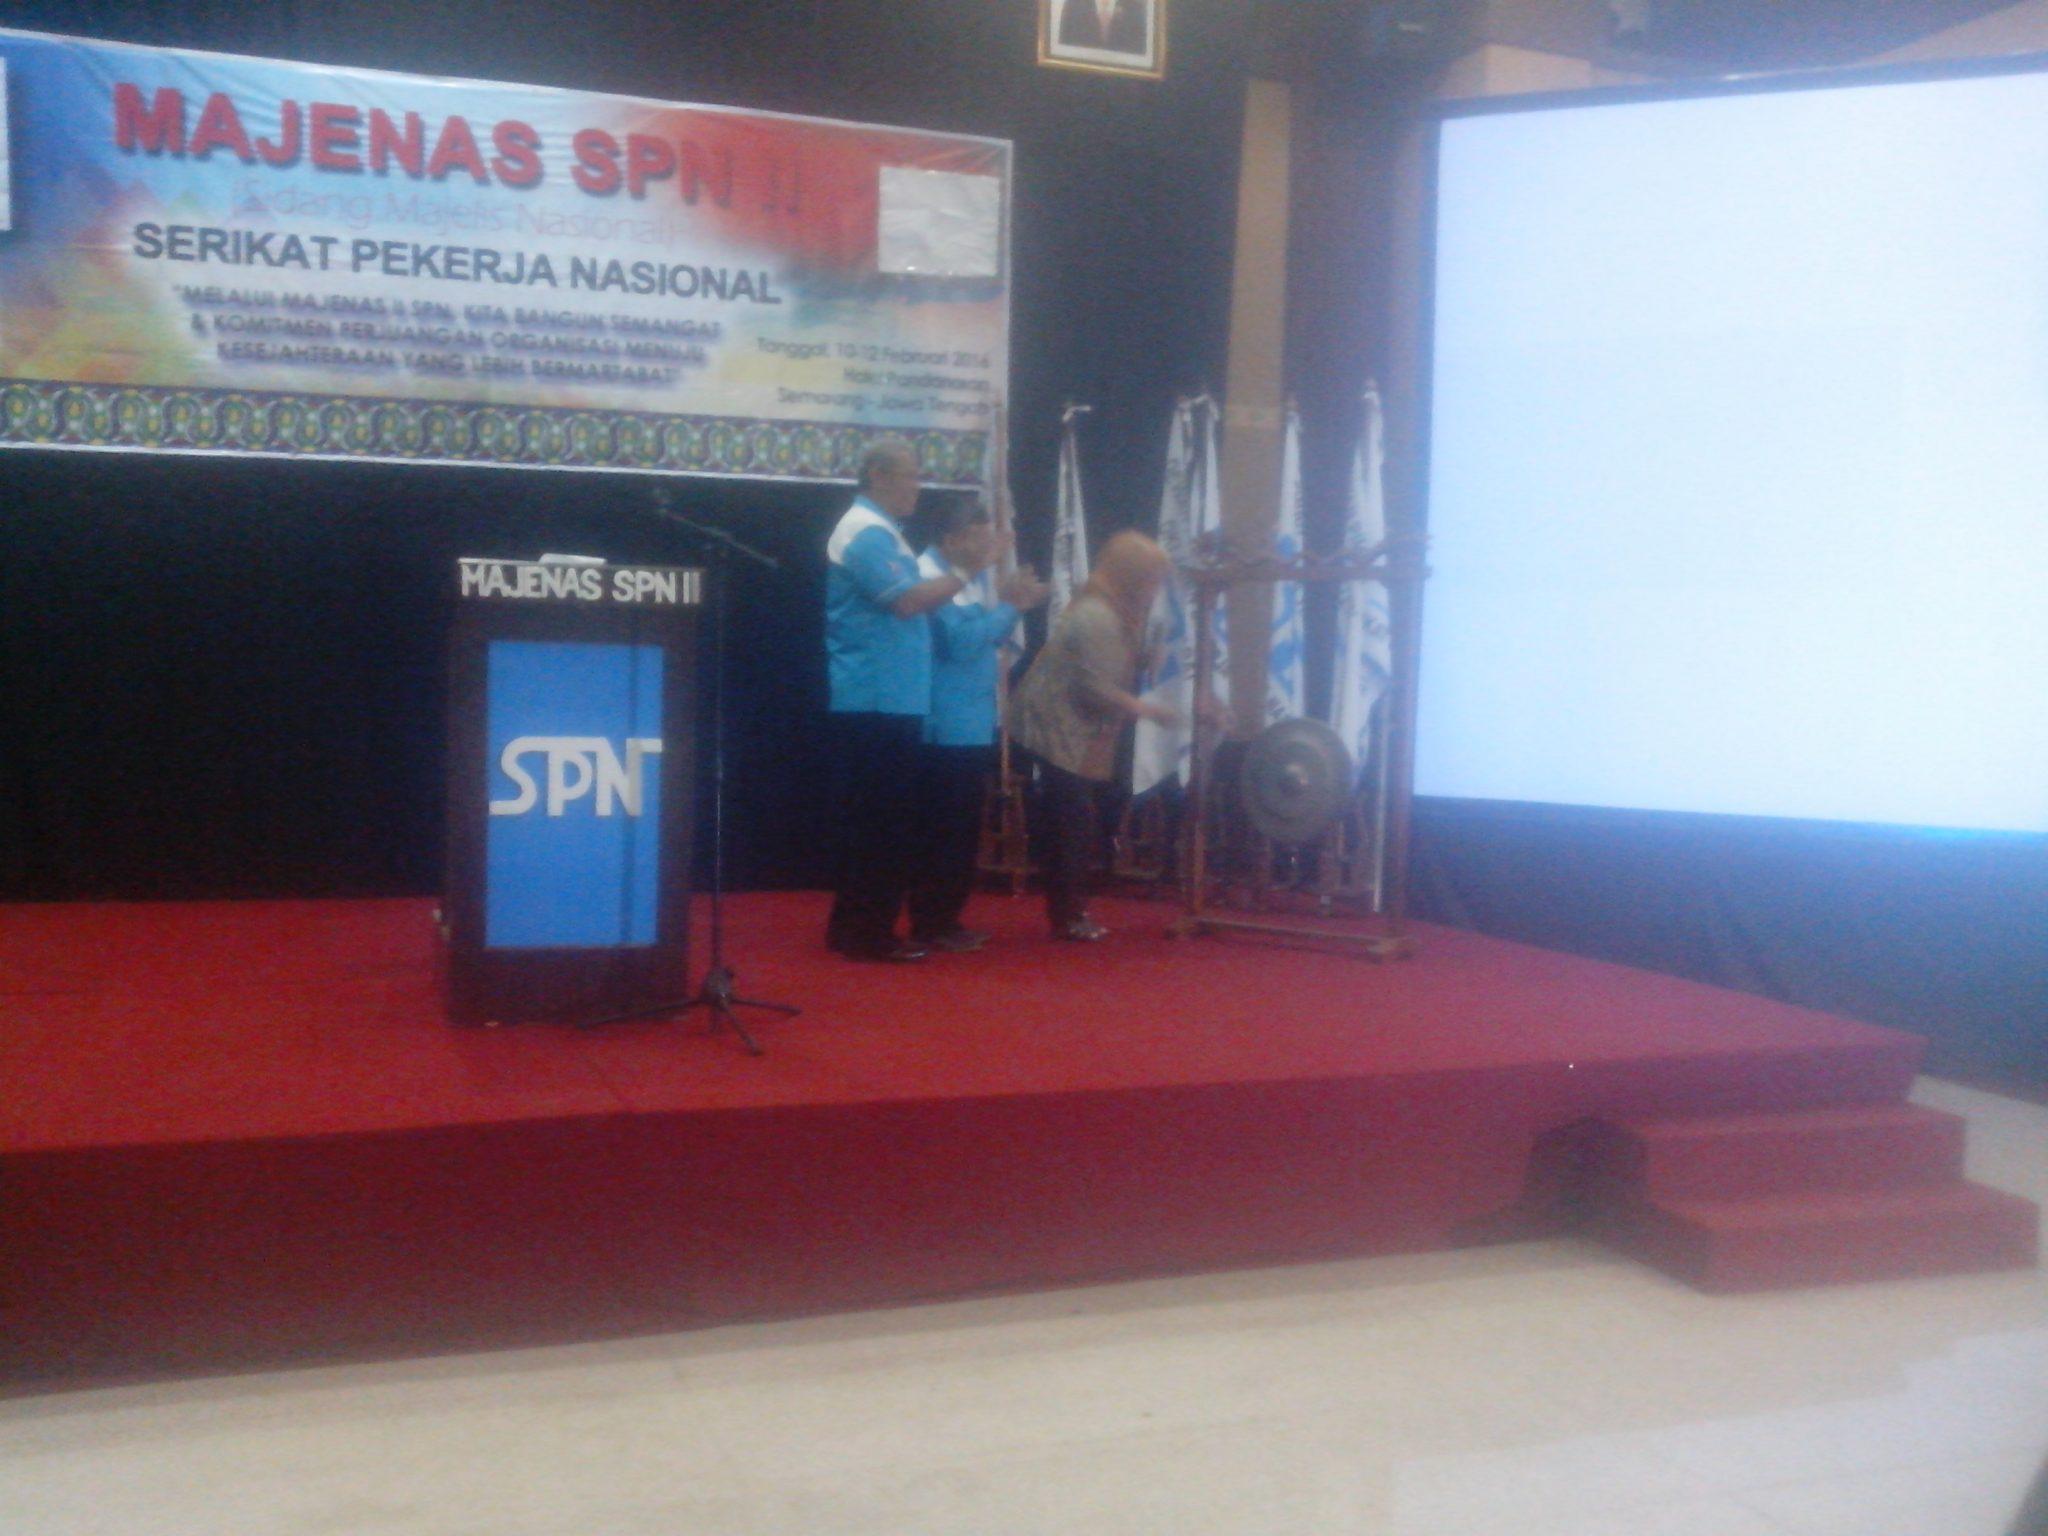 SIDANG MAJENAS SPN II